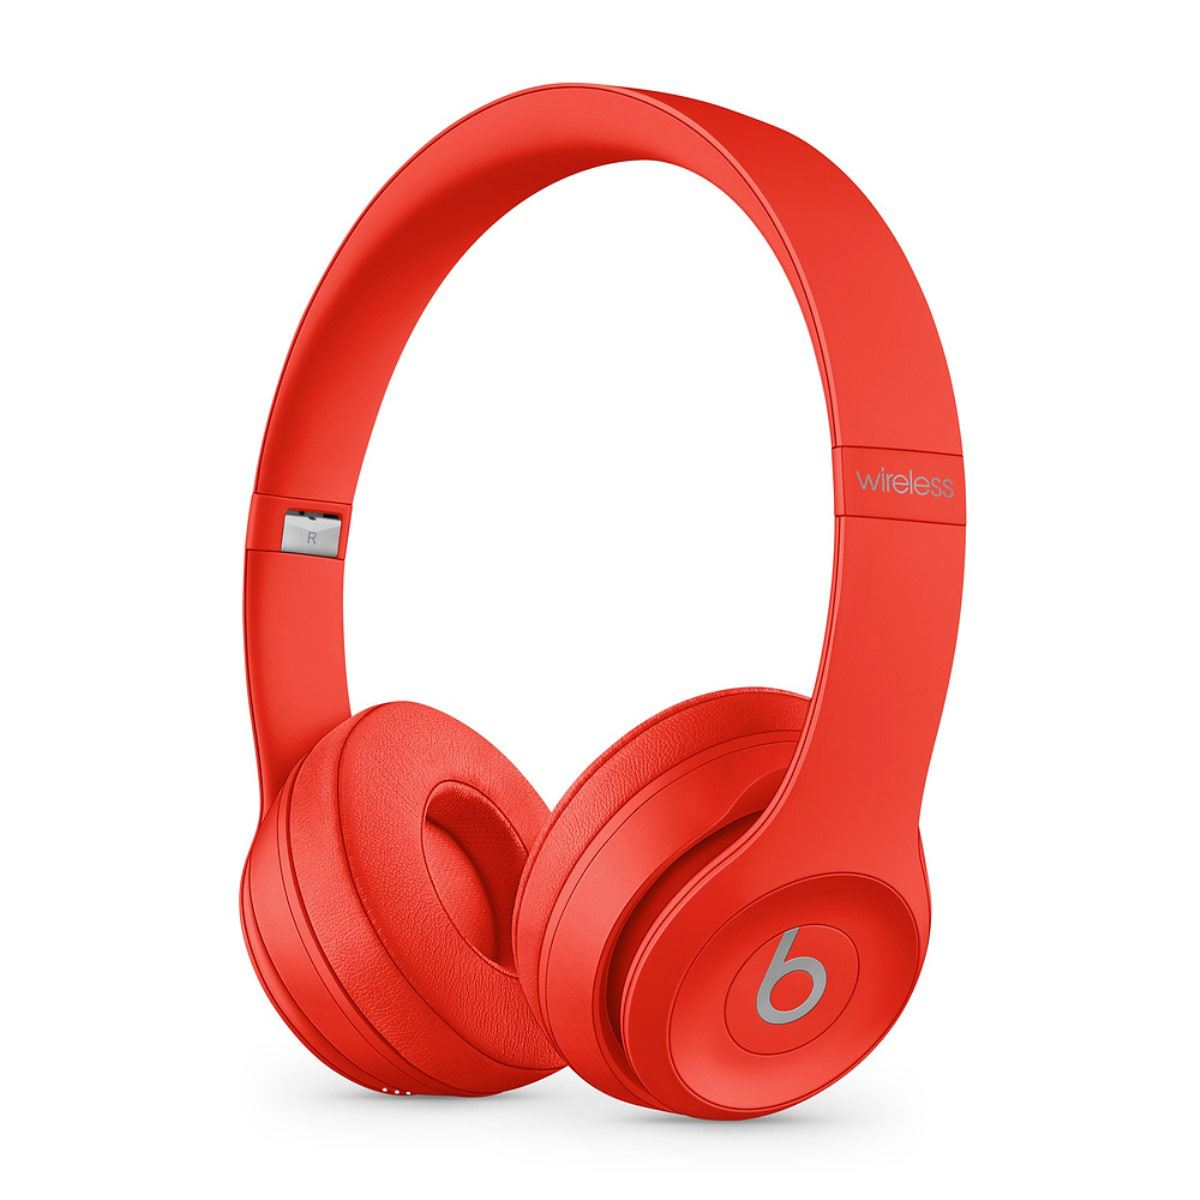 Audífonos Beats Solo3 Wireless Rojo